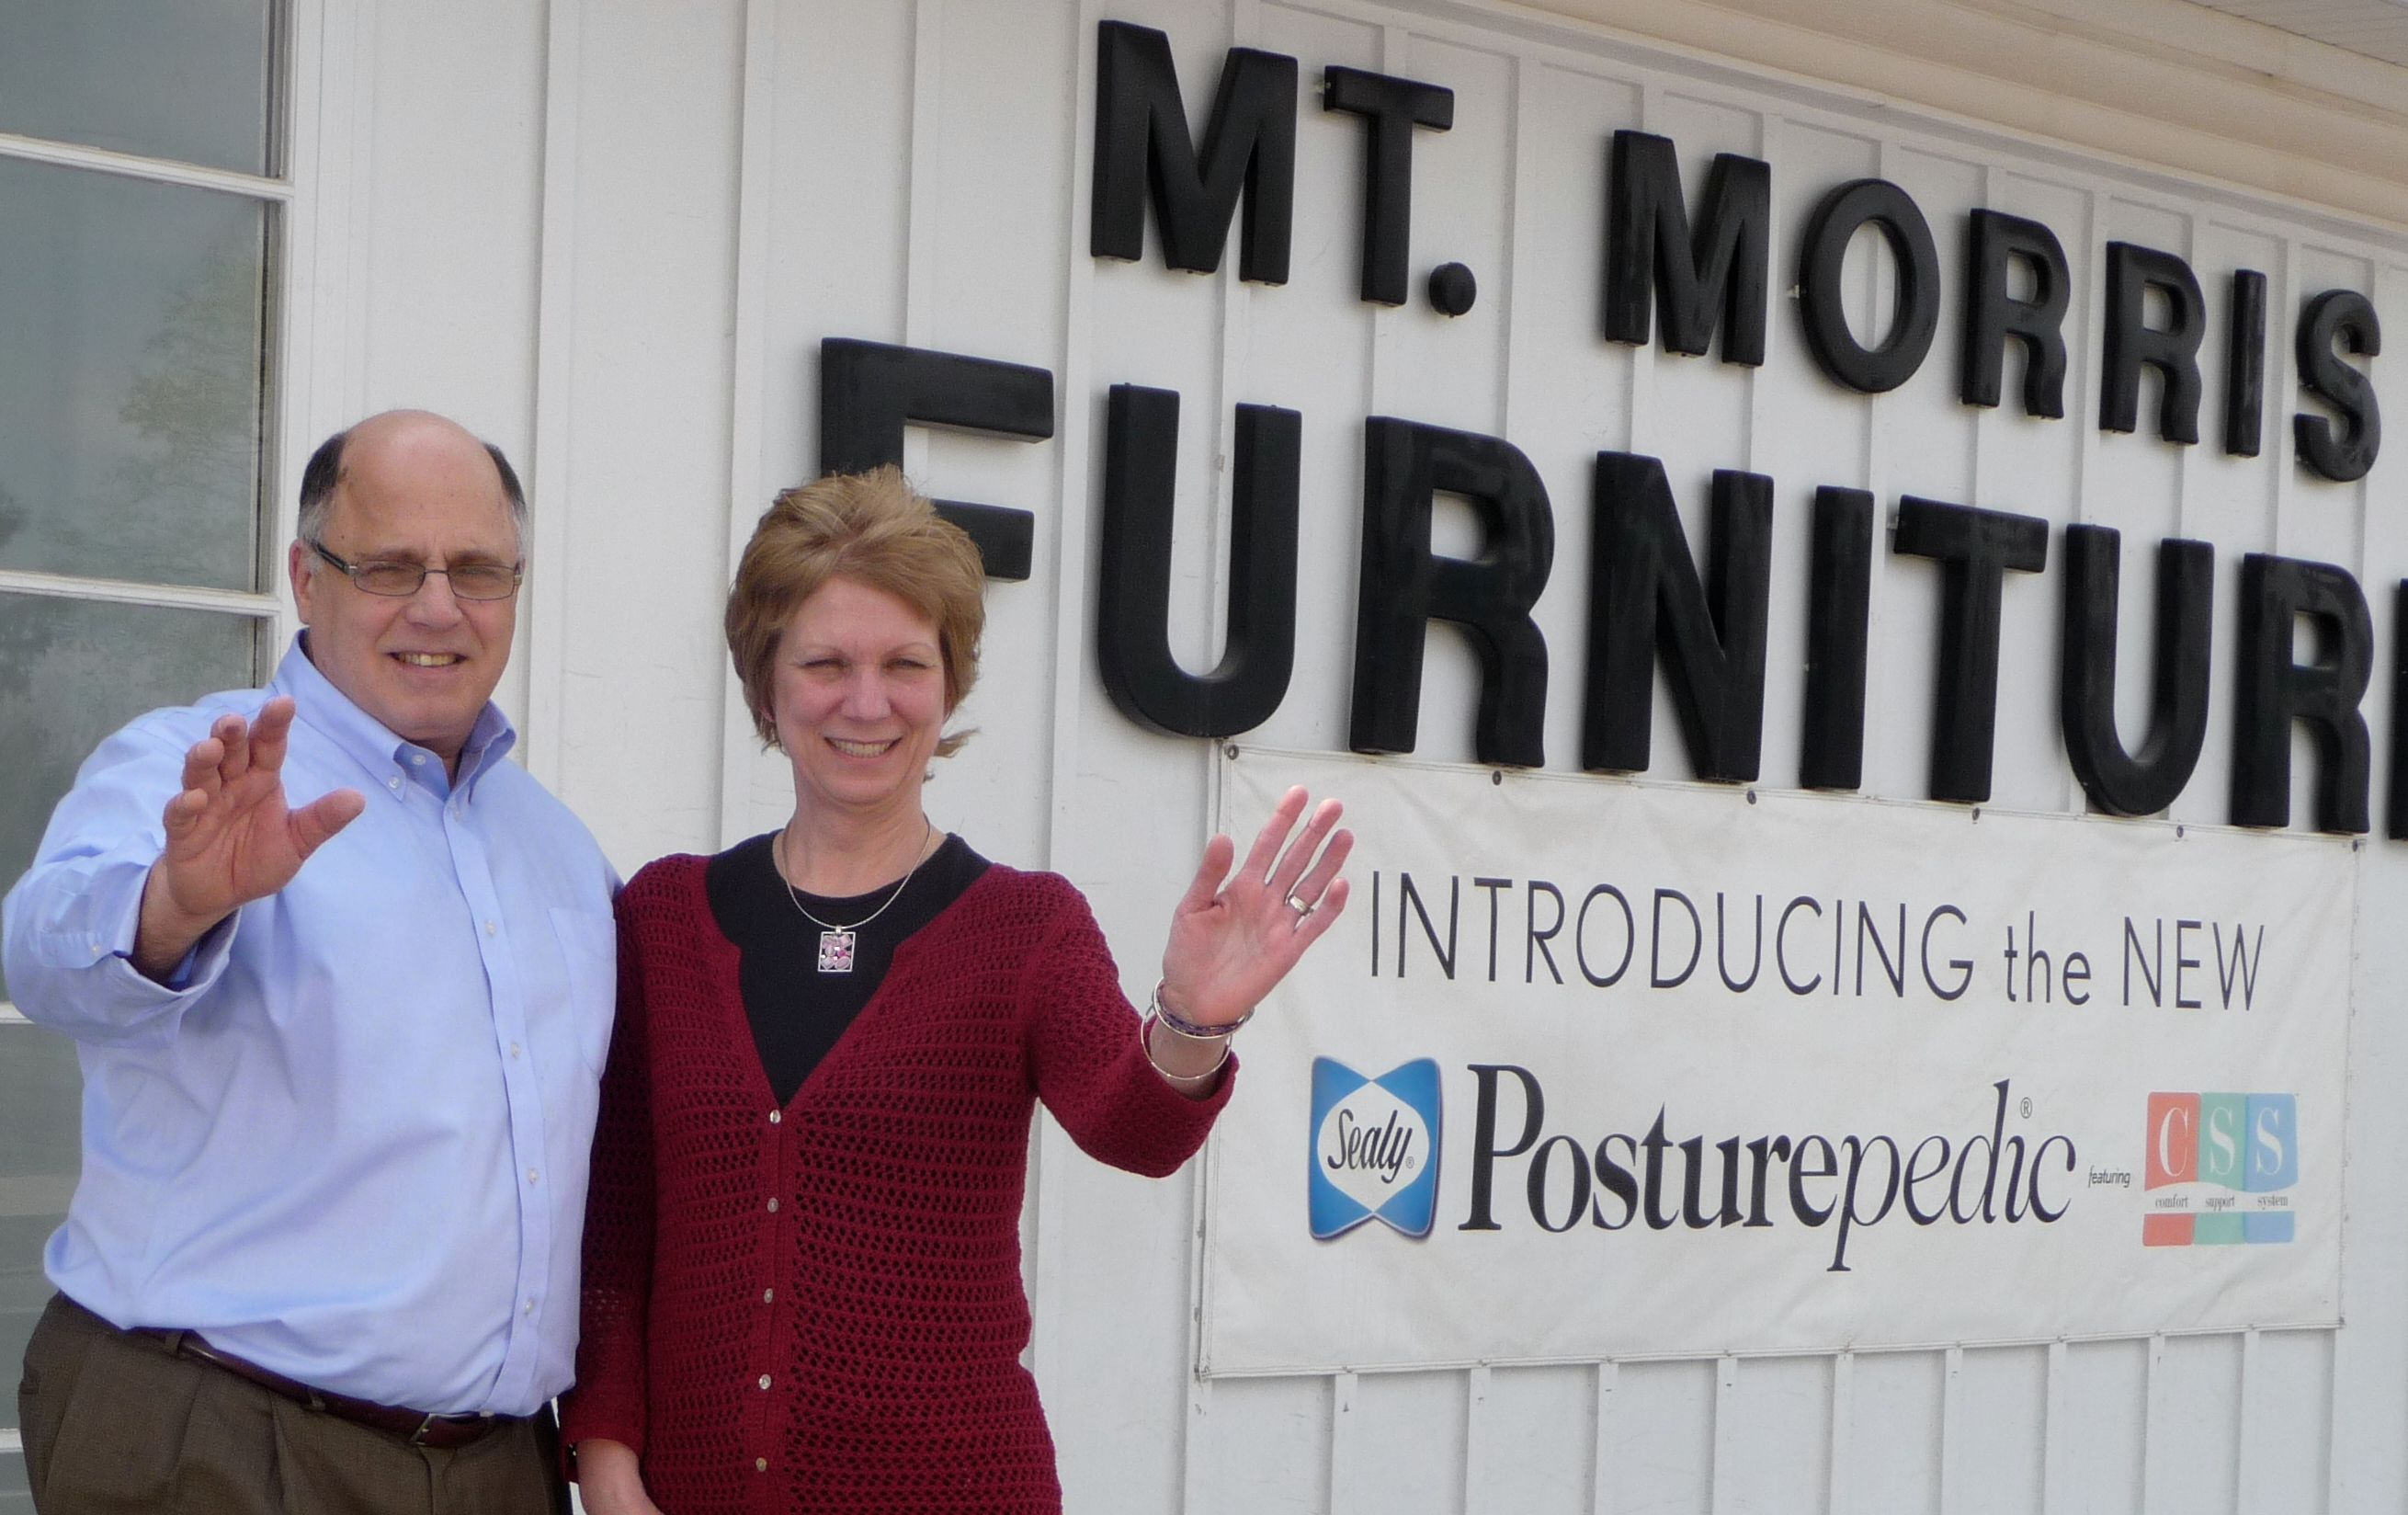 Mount Morris Furniture @ 27 North Main Street Mount Morris, NY